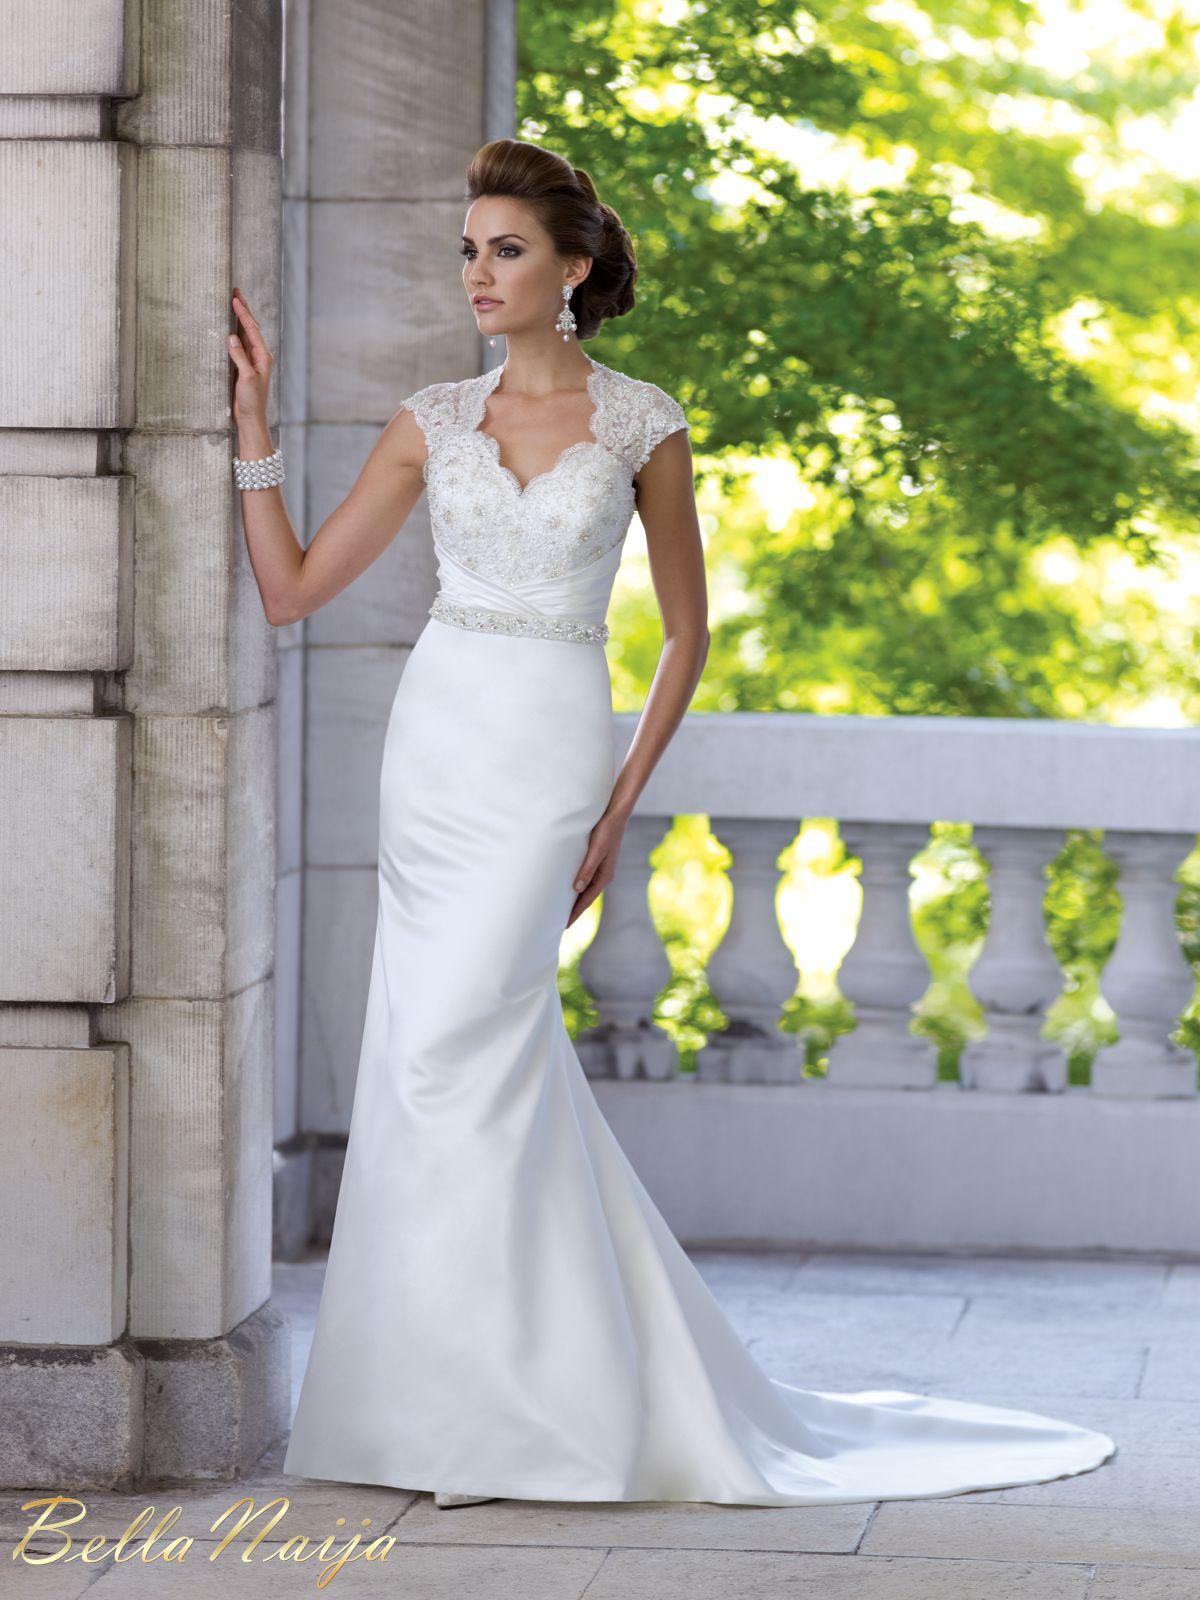 Bn bridal david tutera for mon cheri spring 2013 for How much are mon cheri wedding dresses